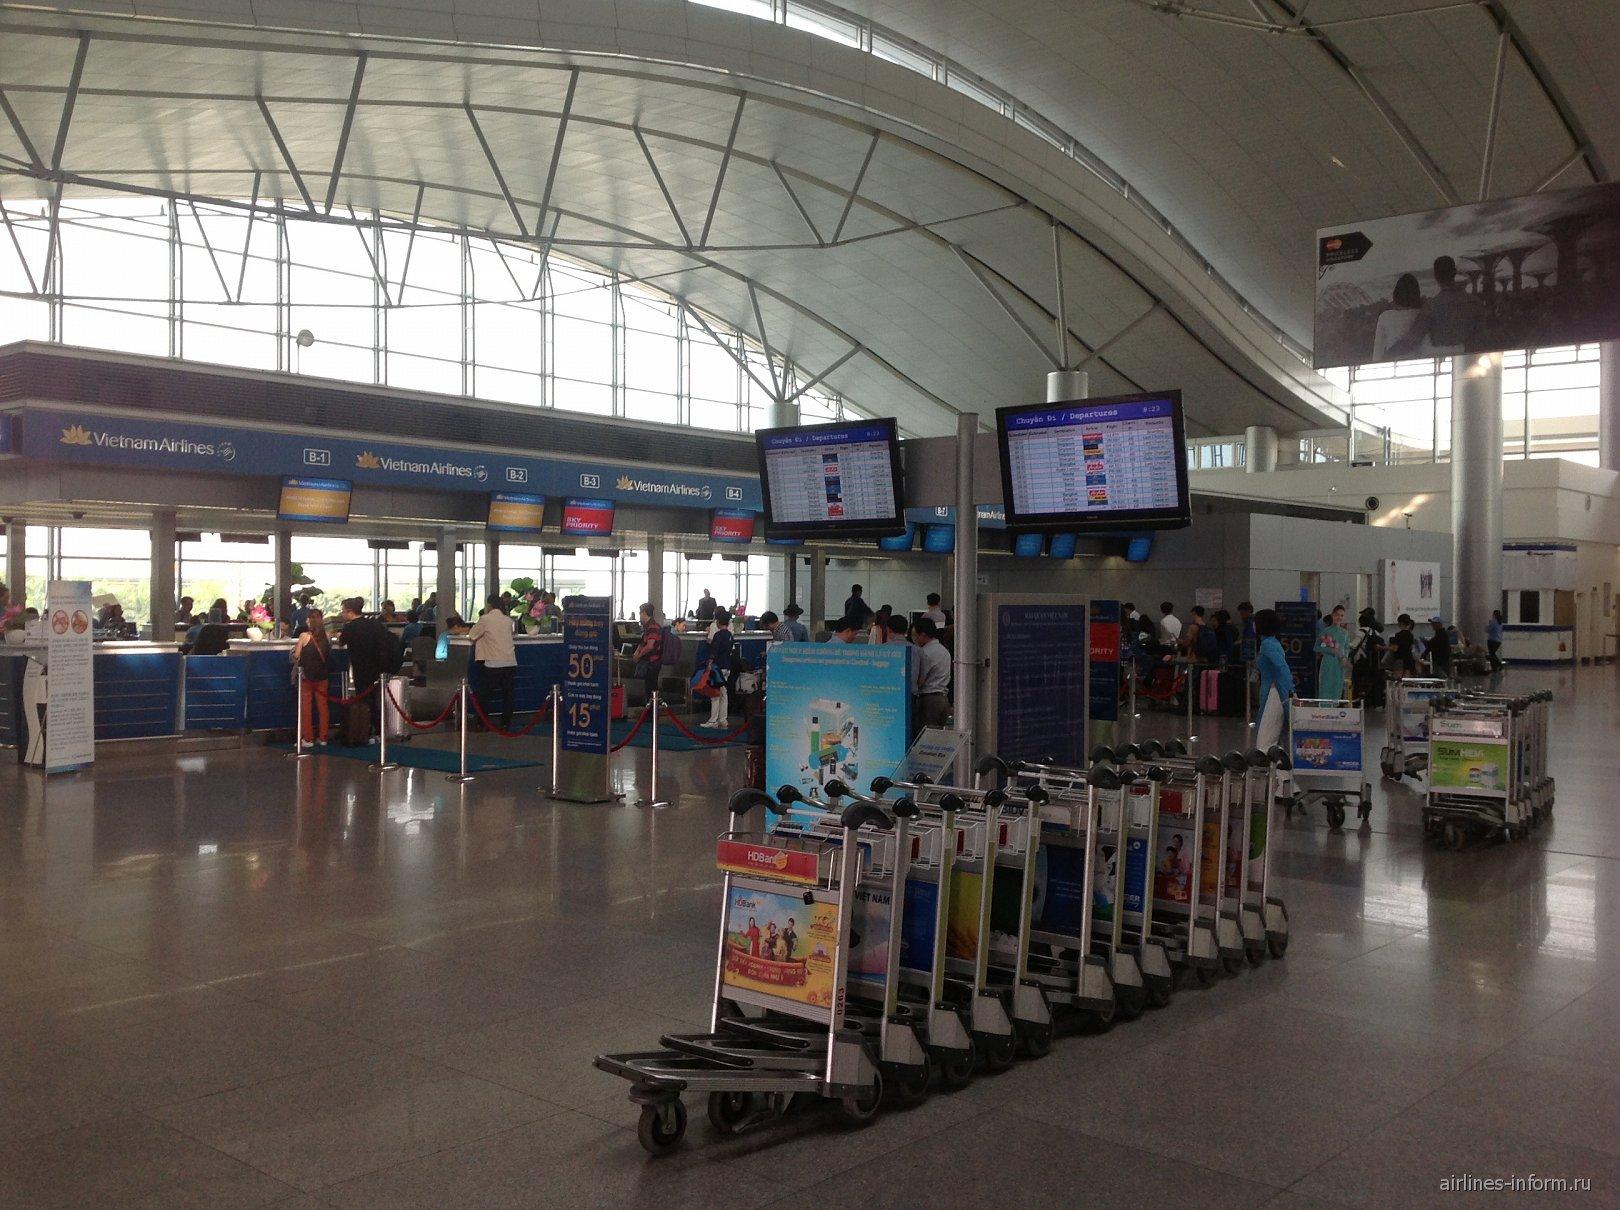 Стойки регистрации Вьетнамских авиалиний в аэропорту Хошимин Тан Сон Нхат